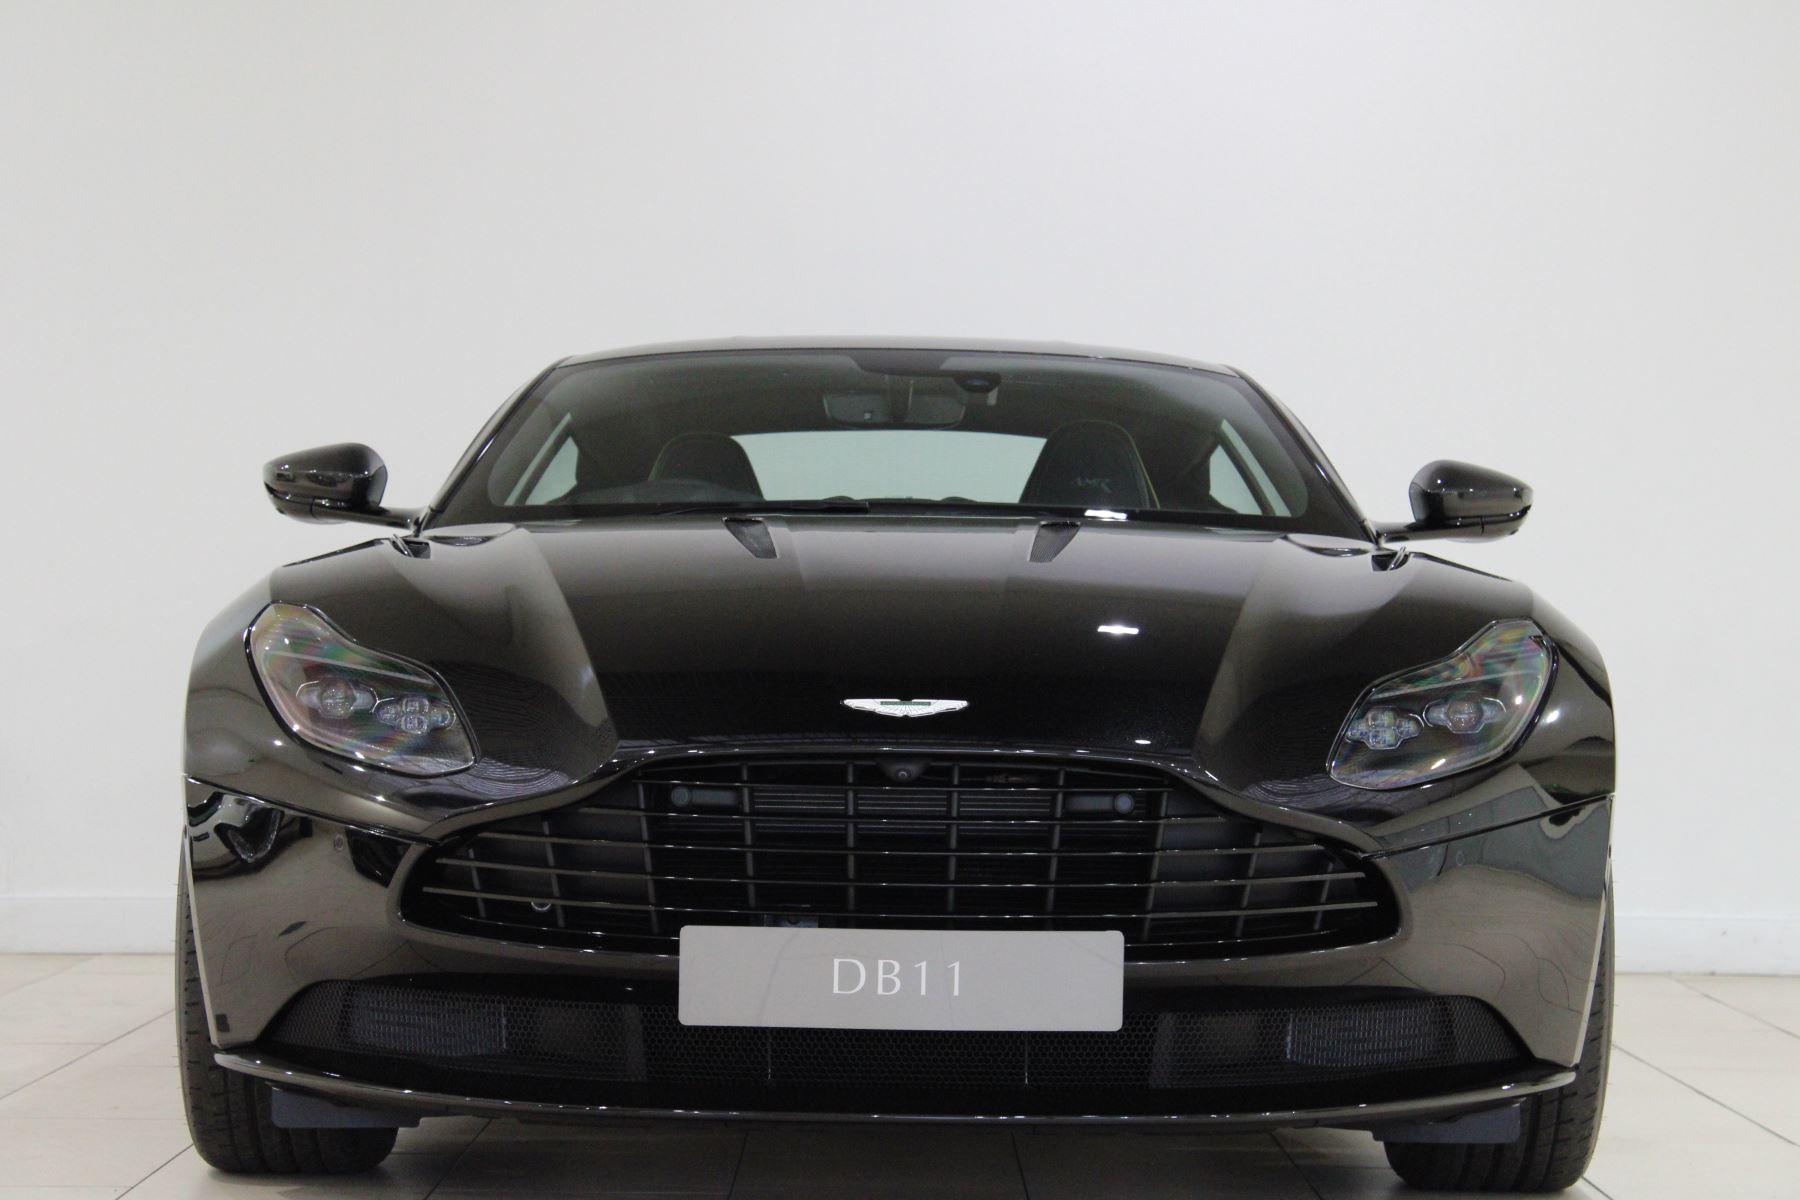 Aston Martin DB11 V12 AMR Touchtronic image 4